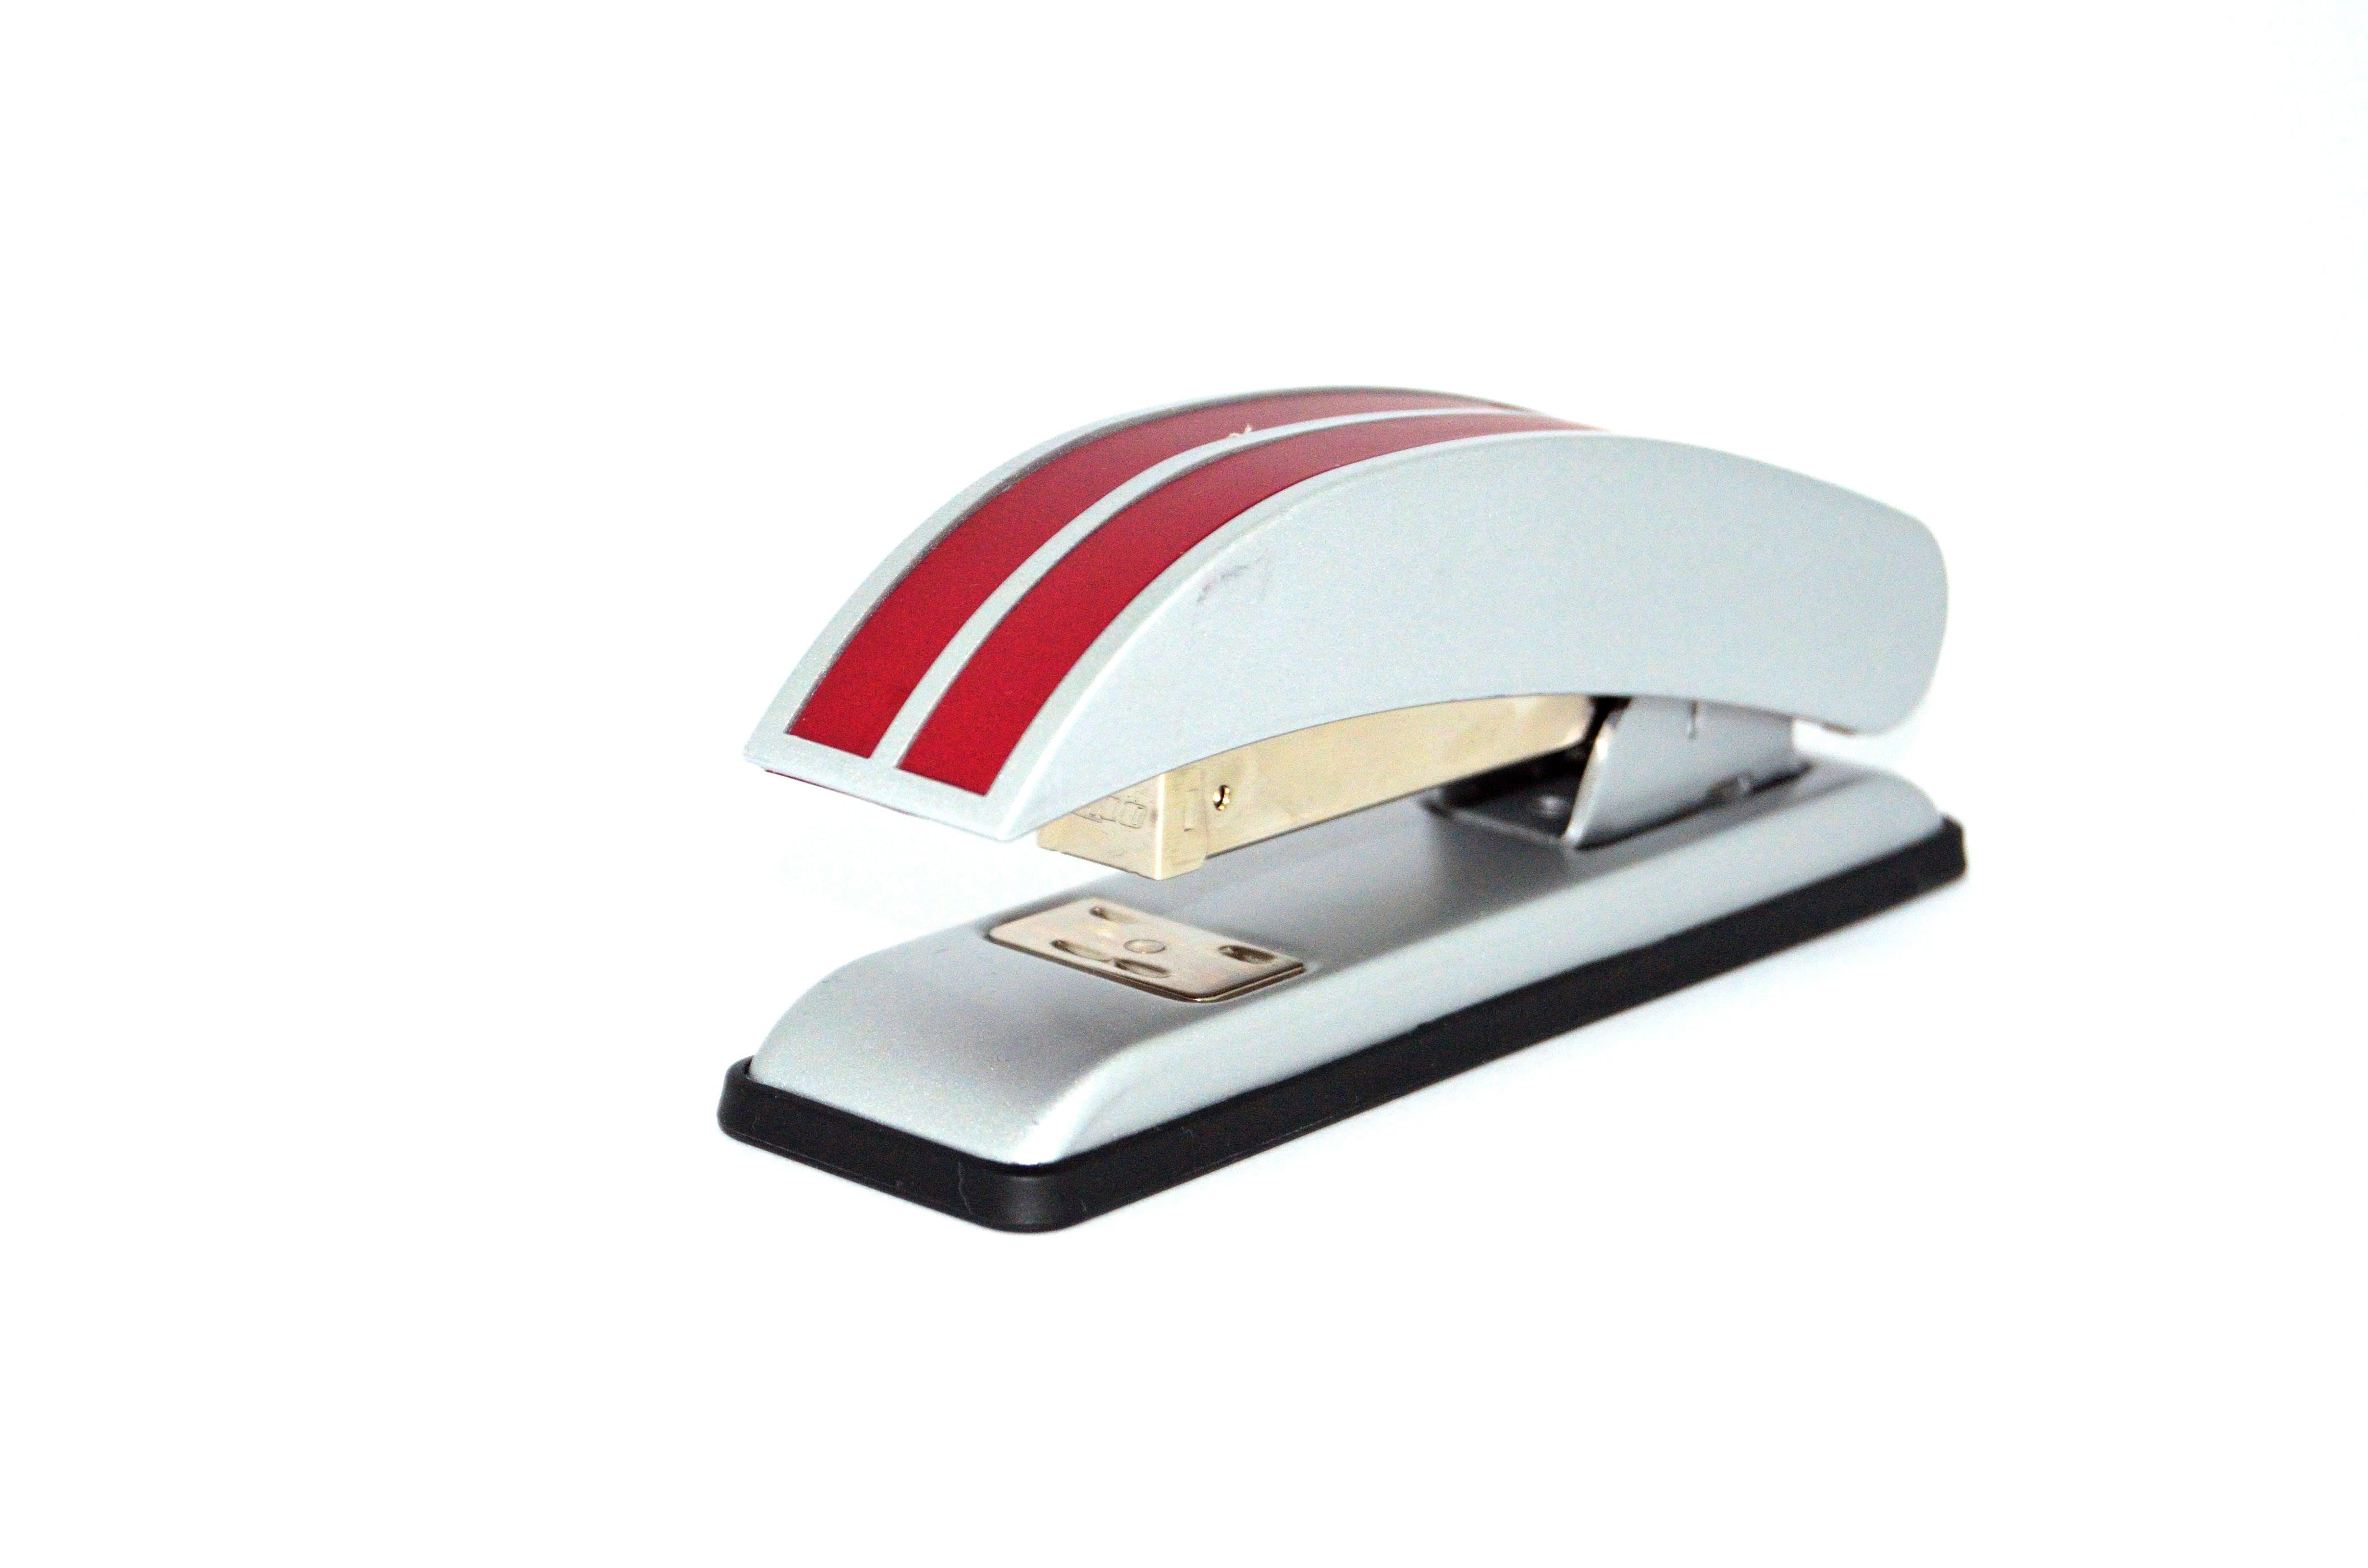 Red and White Stapler